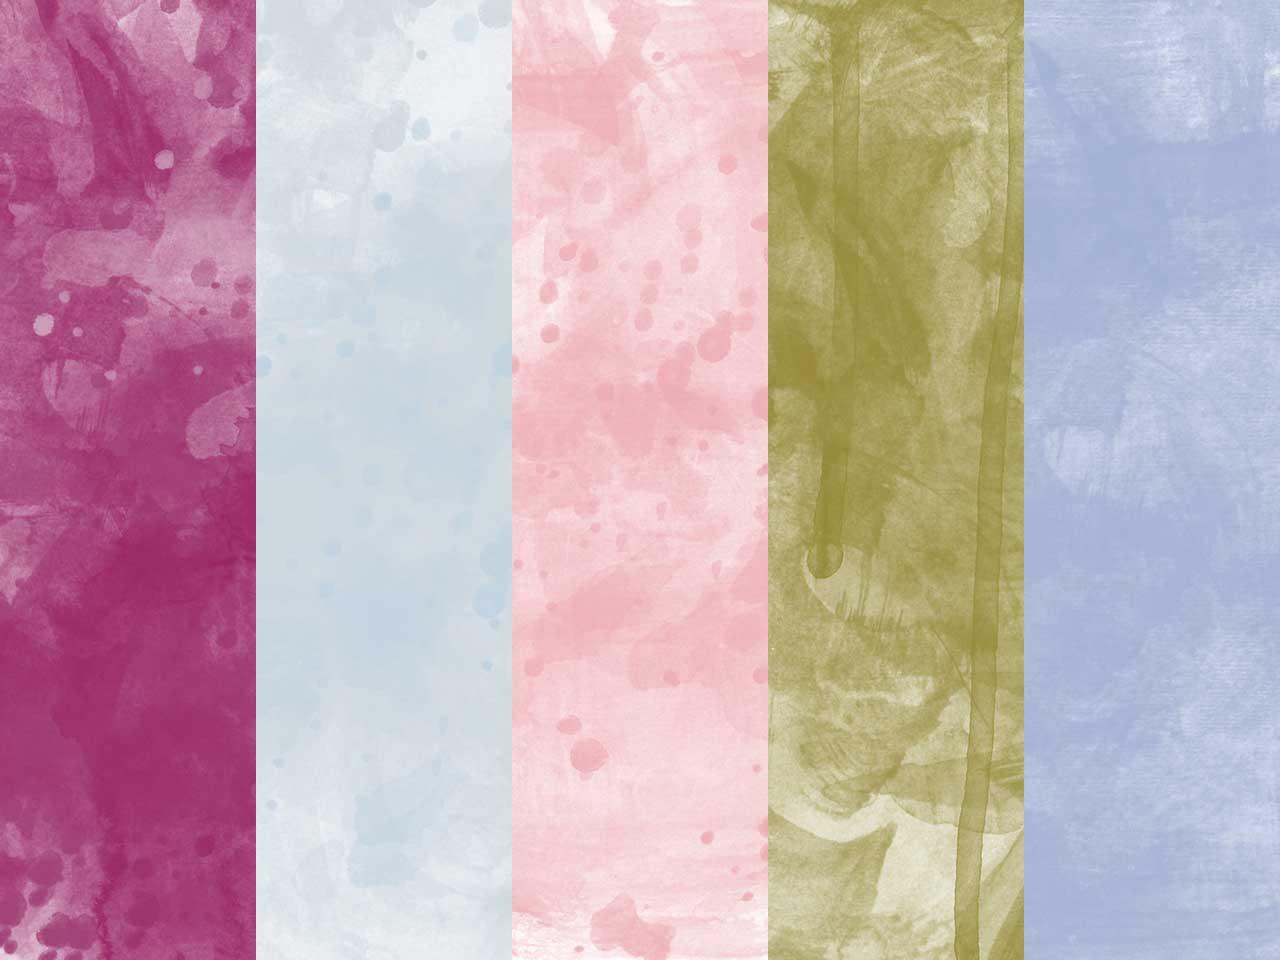 5 Watercolor Texture Backgrounds